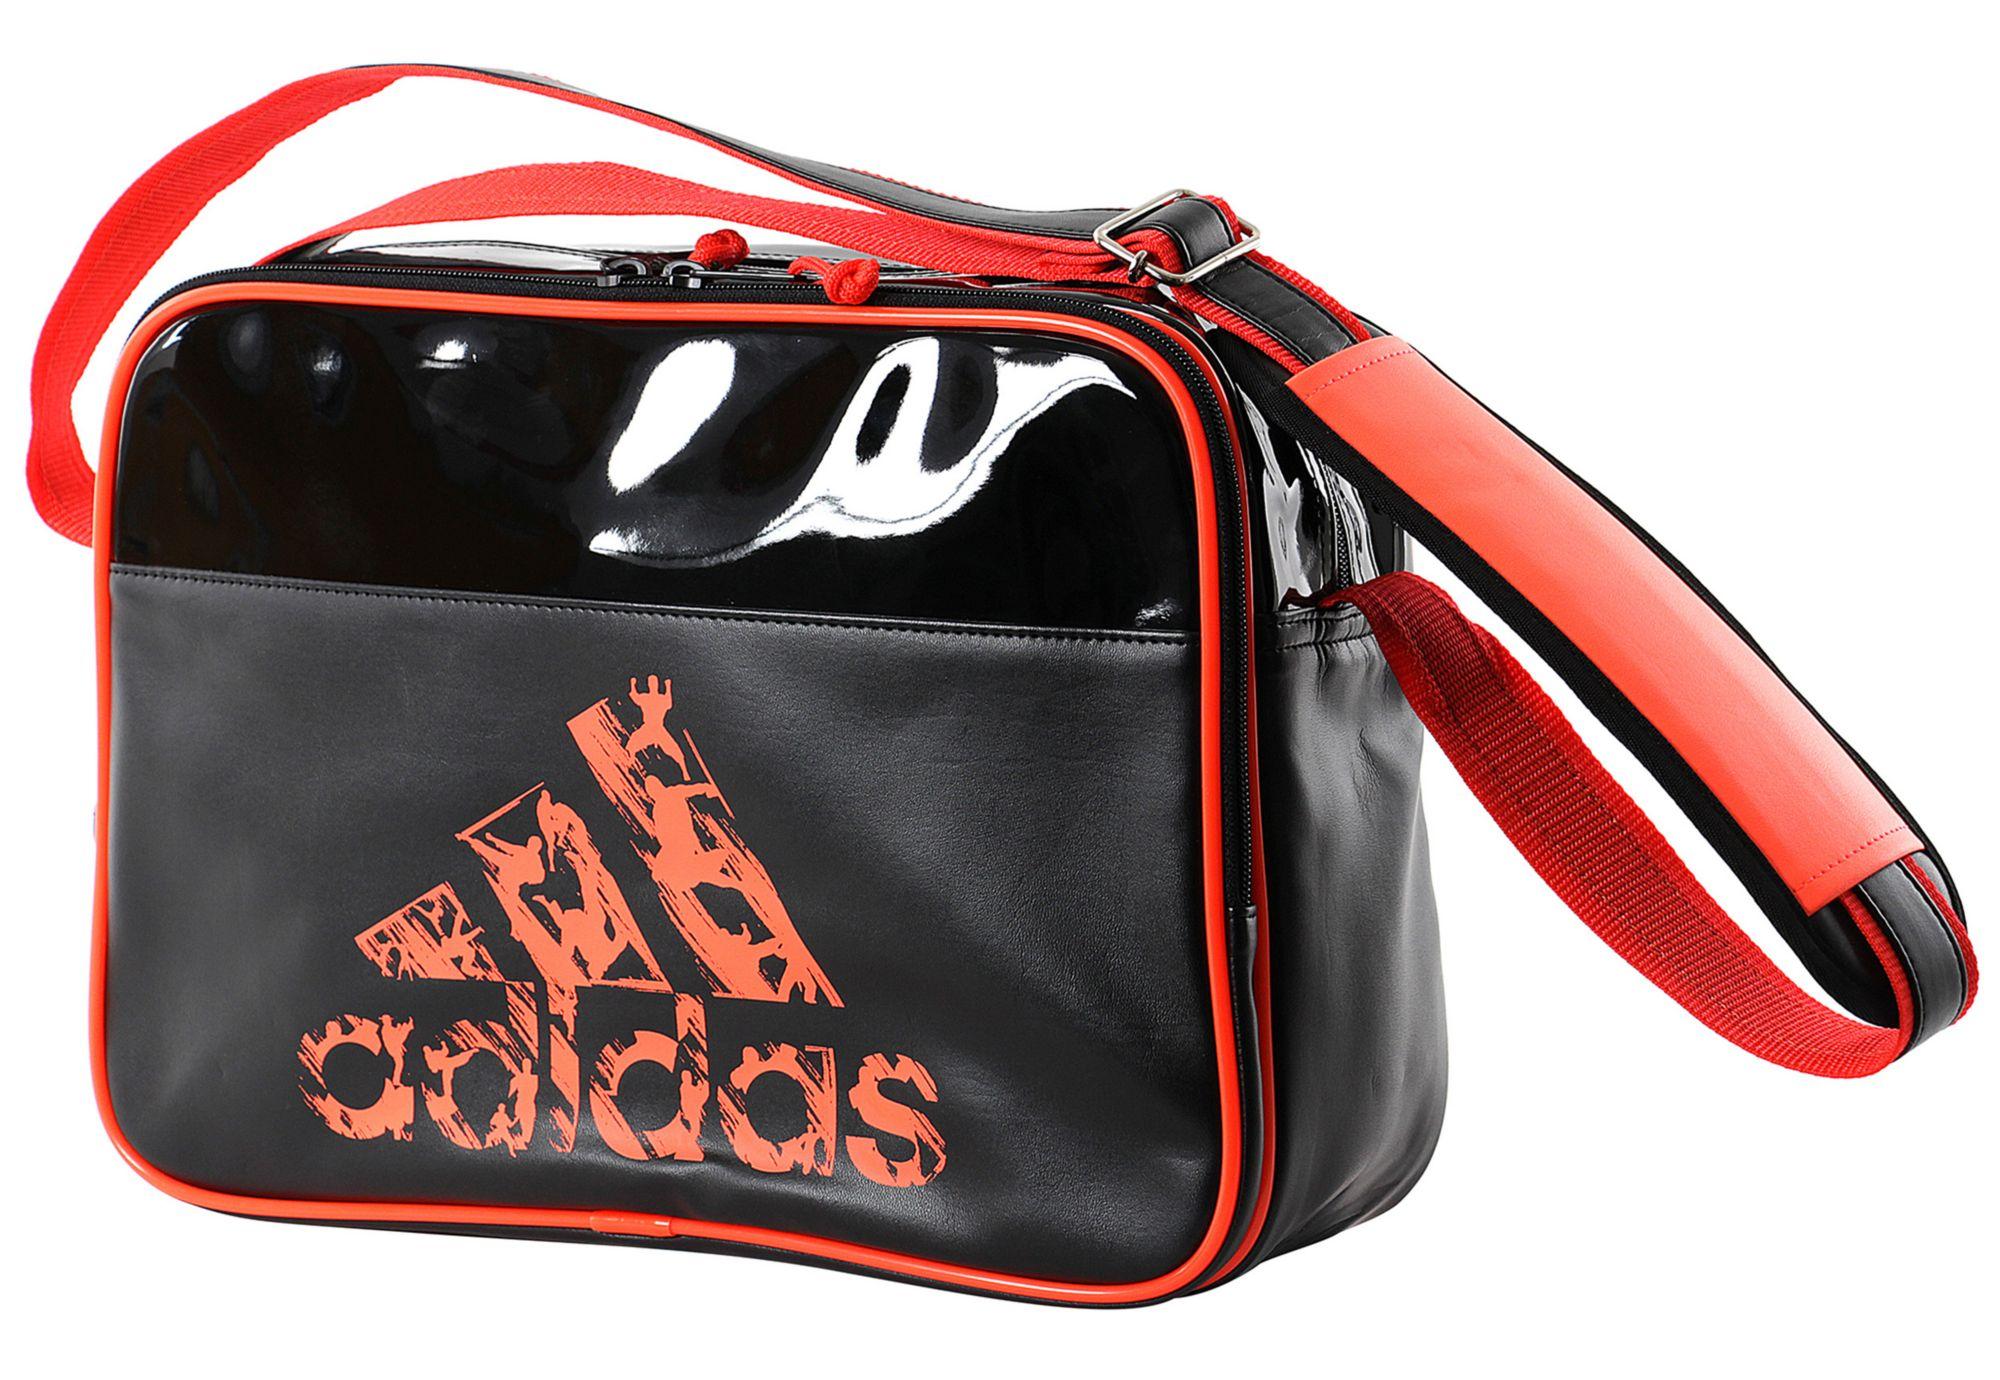 ADIDAS PERFORMANCE adidas Performance Sporttasche, »ADIACC110CS3 orange«